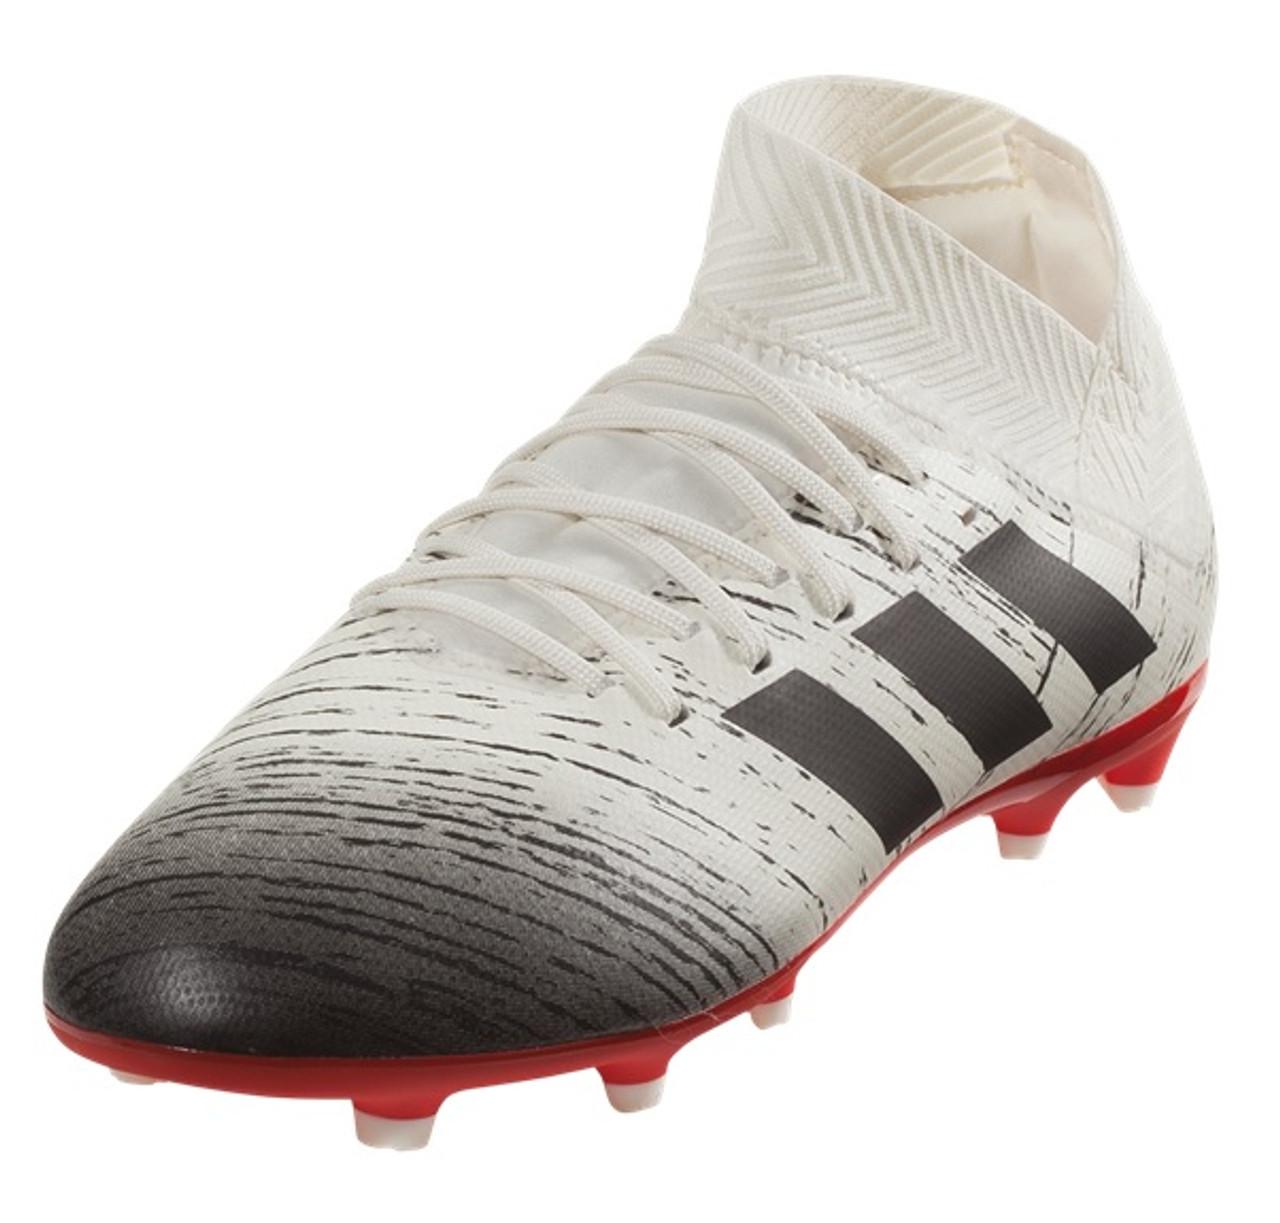 b38bee26df6 Adidas Nemeziz 18.3 FG Jr - Off White Core Black Active Red (050919) - ohp  soccer